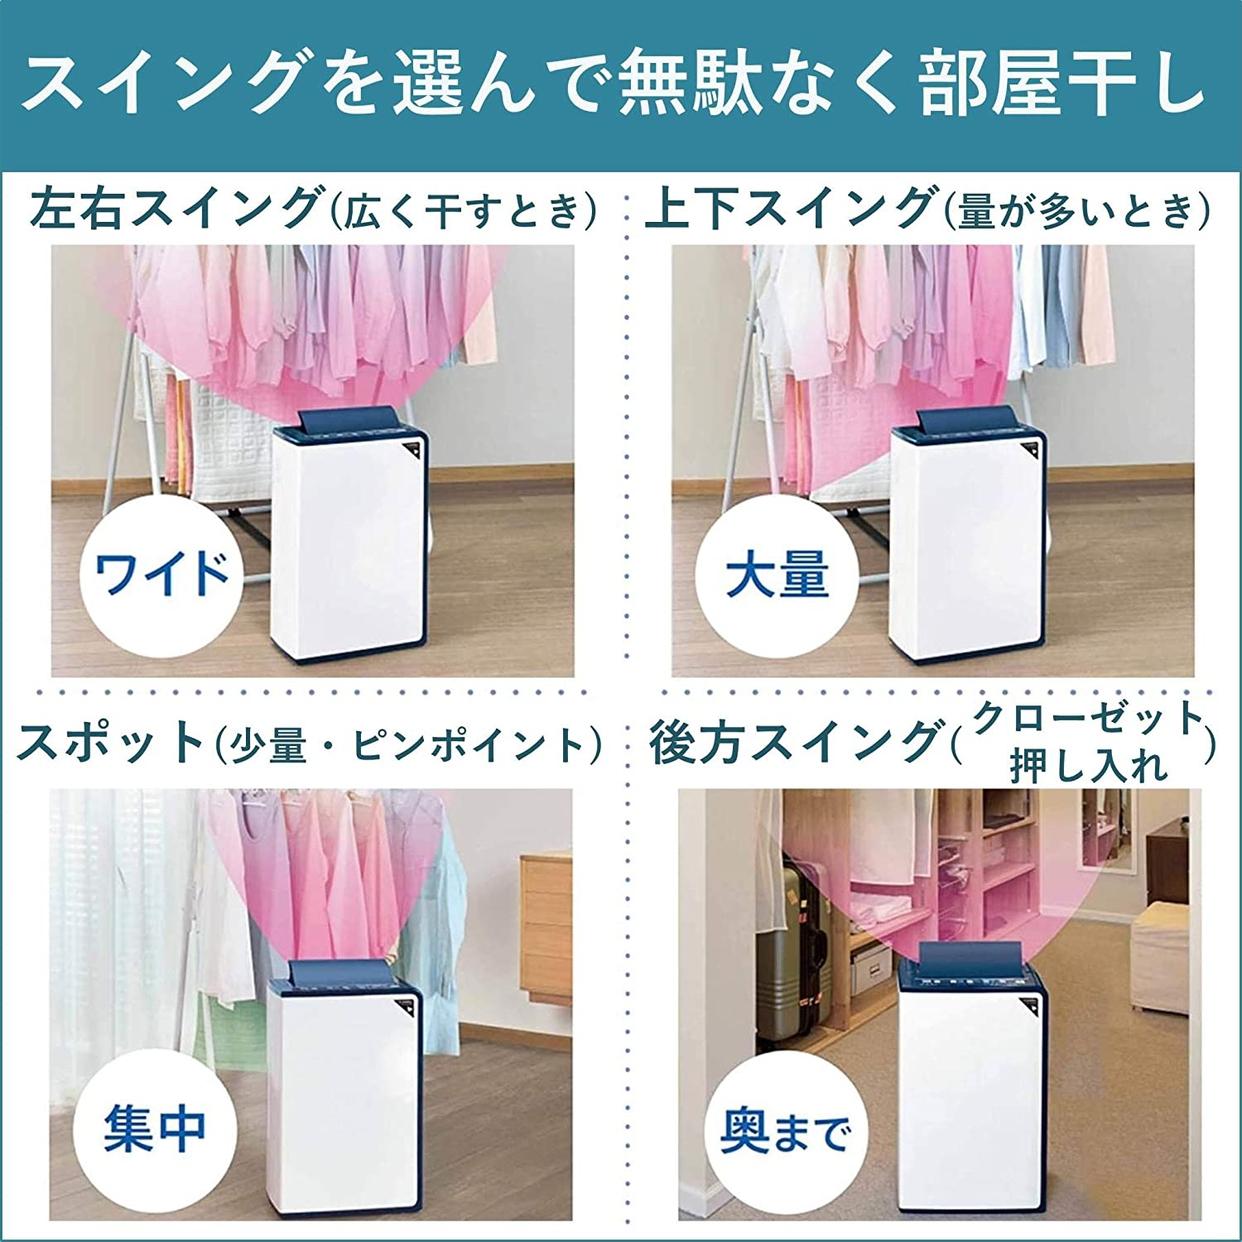 CORONA(コロナ) 衣類乾燥除湿機 CD-H1818の商品画像6